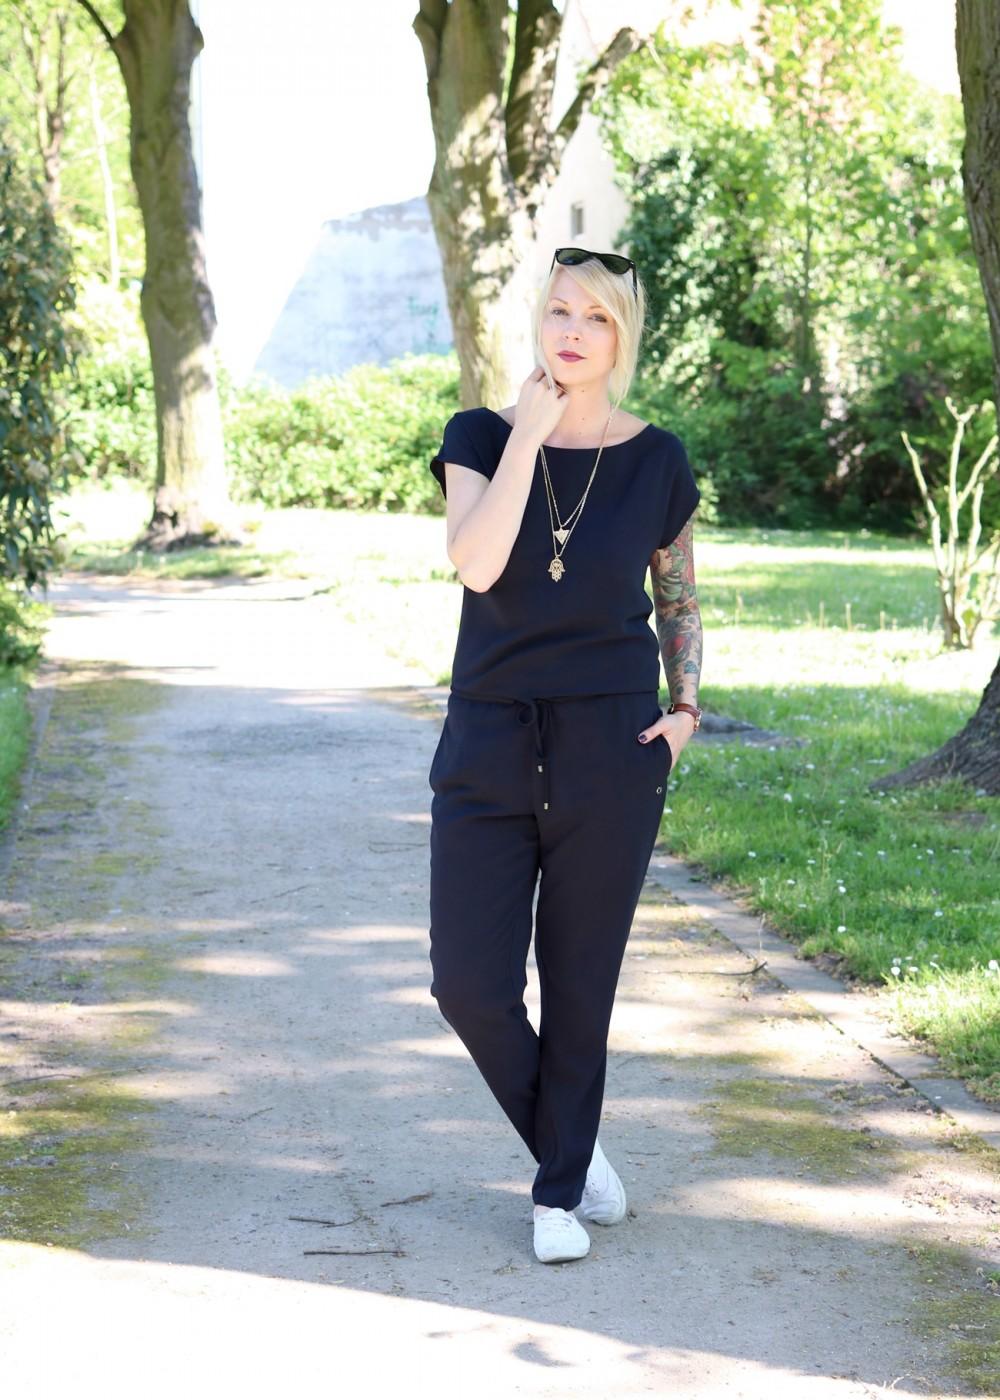 Fashionbloggerin Karlsruhe Outfit Jumpsuit Aldi Jette Joop Daniel Wellington Dapper (1)